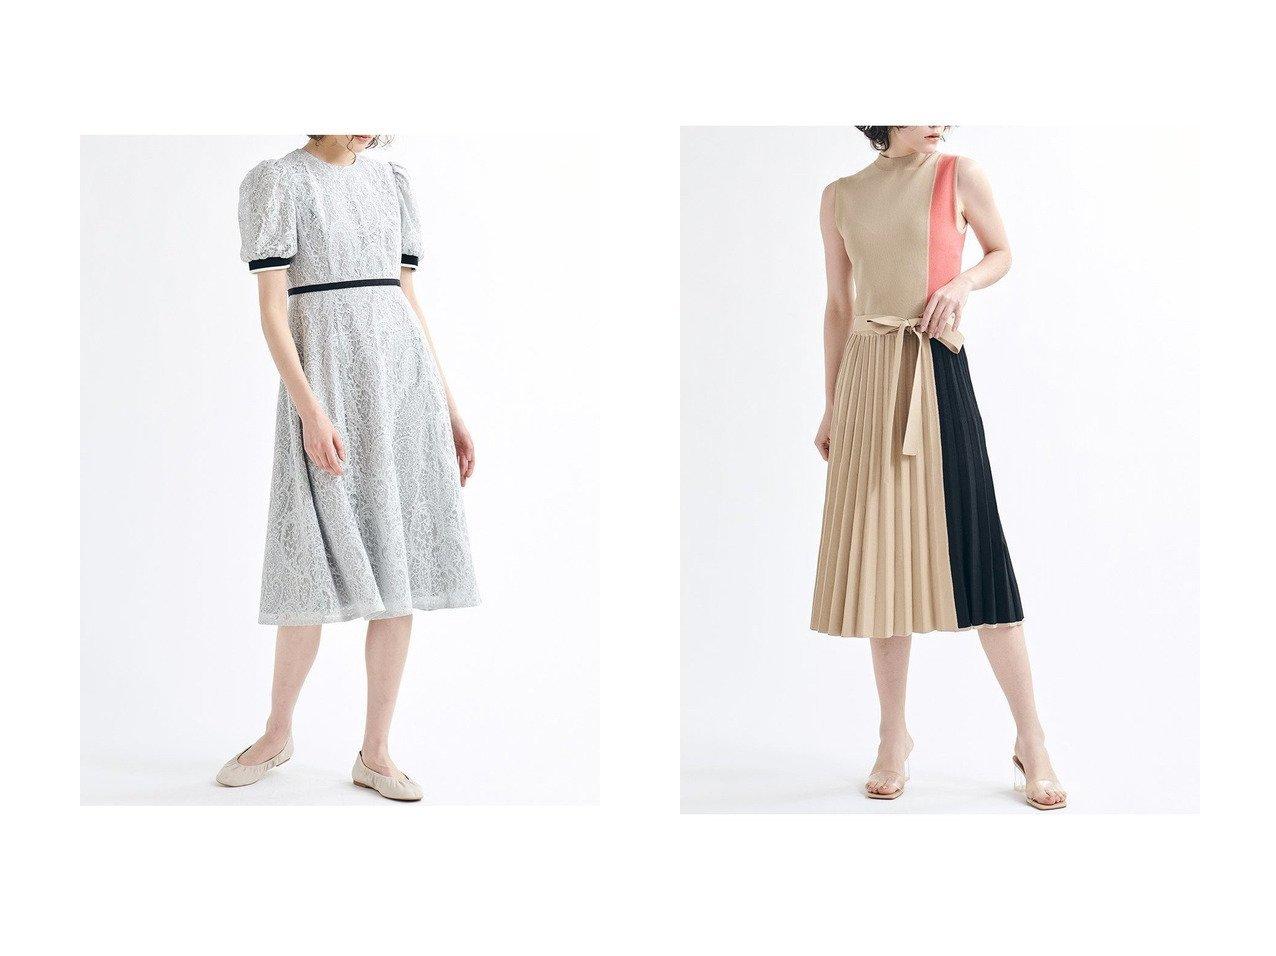 【LANVIN en Bleu/ランバン オン ブルー】のバイカラーニットワンピース&レースパフスリーブワンピース ワンピース・ドレスのおすすめ!人気、トレンド・レディースファッションの通販 おすすめで人気の流行・トレンド、ファッションの通販商品 メンズファッション・キッズファッション・インテリア・家具・レディースファッション・服の通販 founy(ファニー) https://founy.com/ ファッション Fashion レディースファッション WOMEN ワンピース Dress ニットワンピース Knit Dresses 2021年 2021 2021 春夏 S/S SS Spring/Summer 2021 S/S 春夏 SS Spring/Summer おすすめ Recommend エレガント オレンジ ジャケット デスク ノースリーブ ハイネック バランス ブロック プリーツ ロング ワーク 春 Spring |ID:crp329100000024801